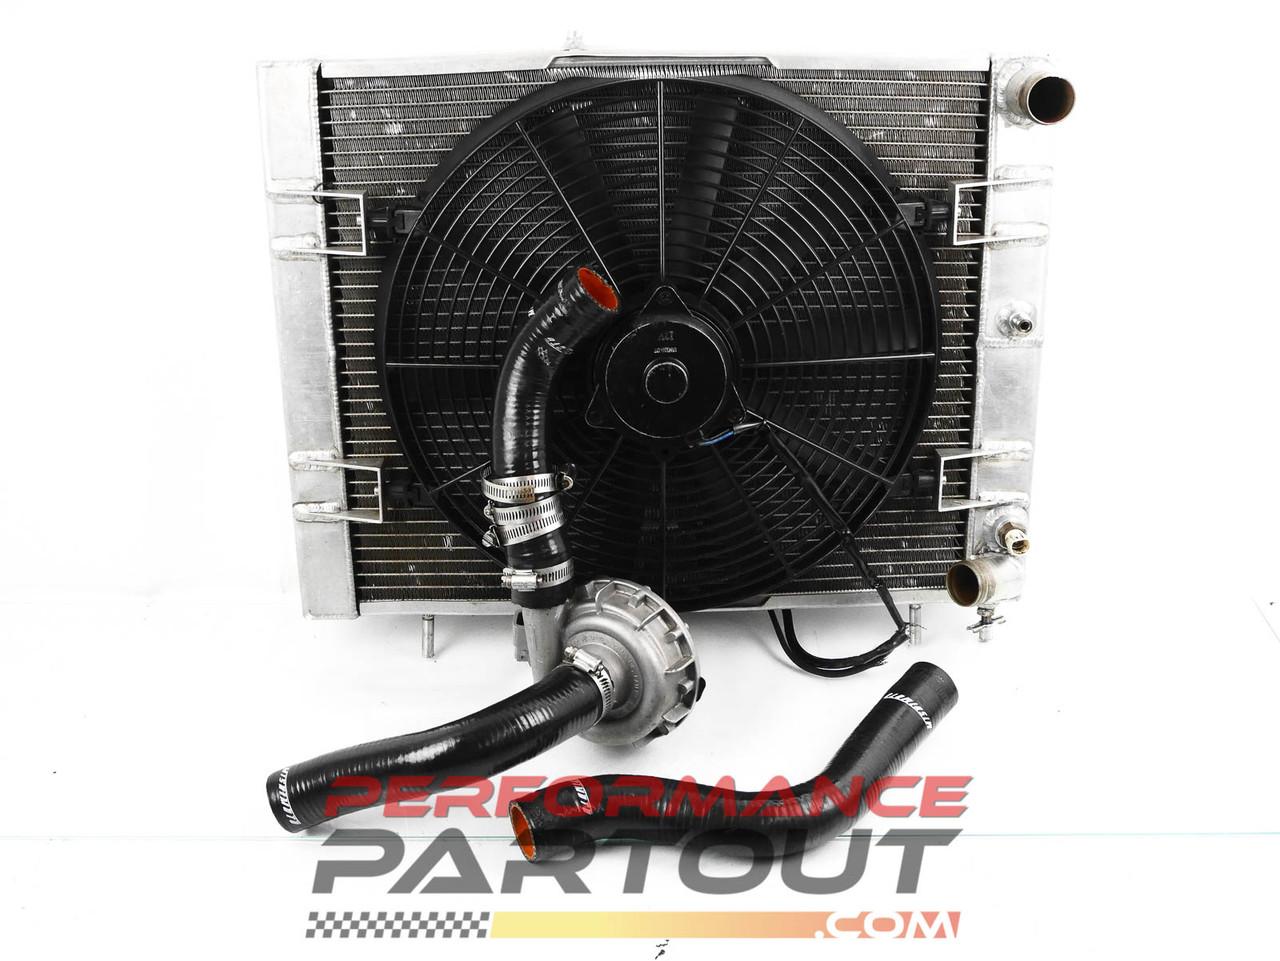 Aluminum Radiator w/ Electric water pump set PRTOUT